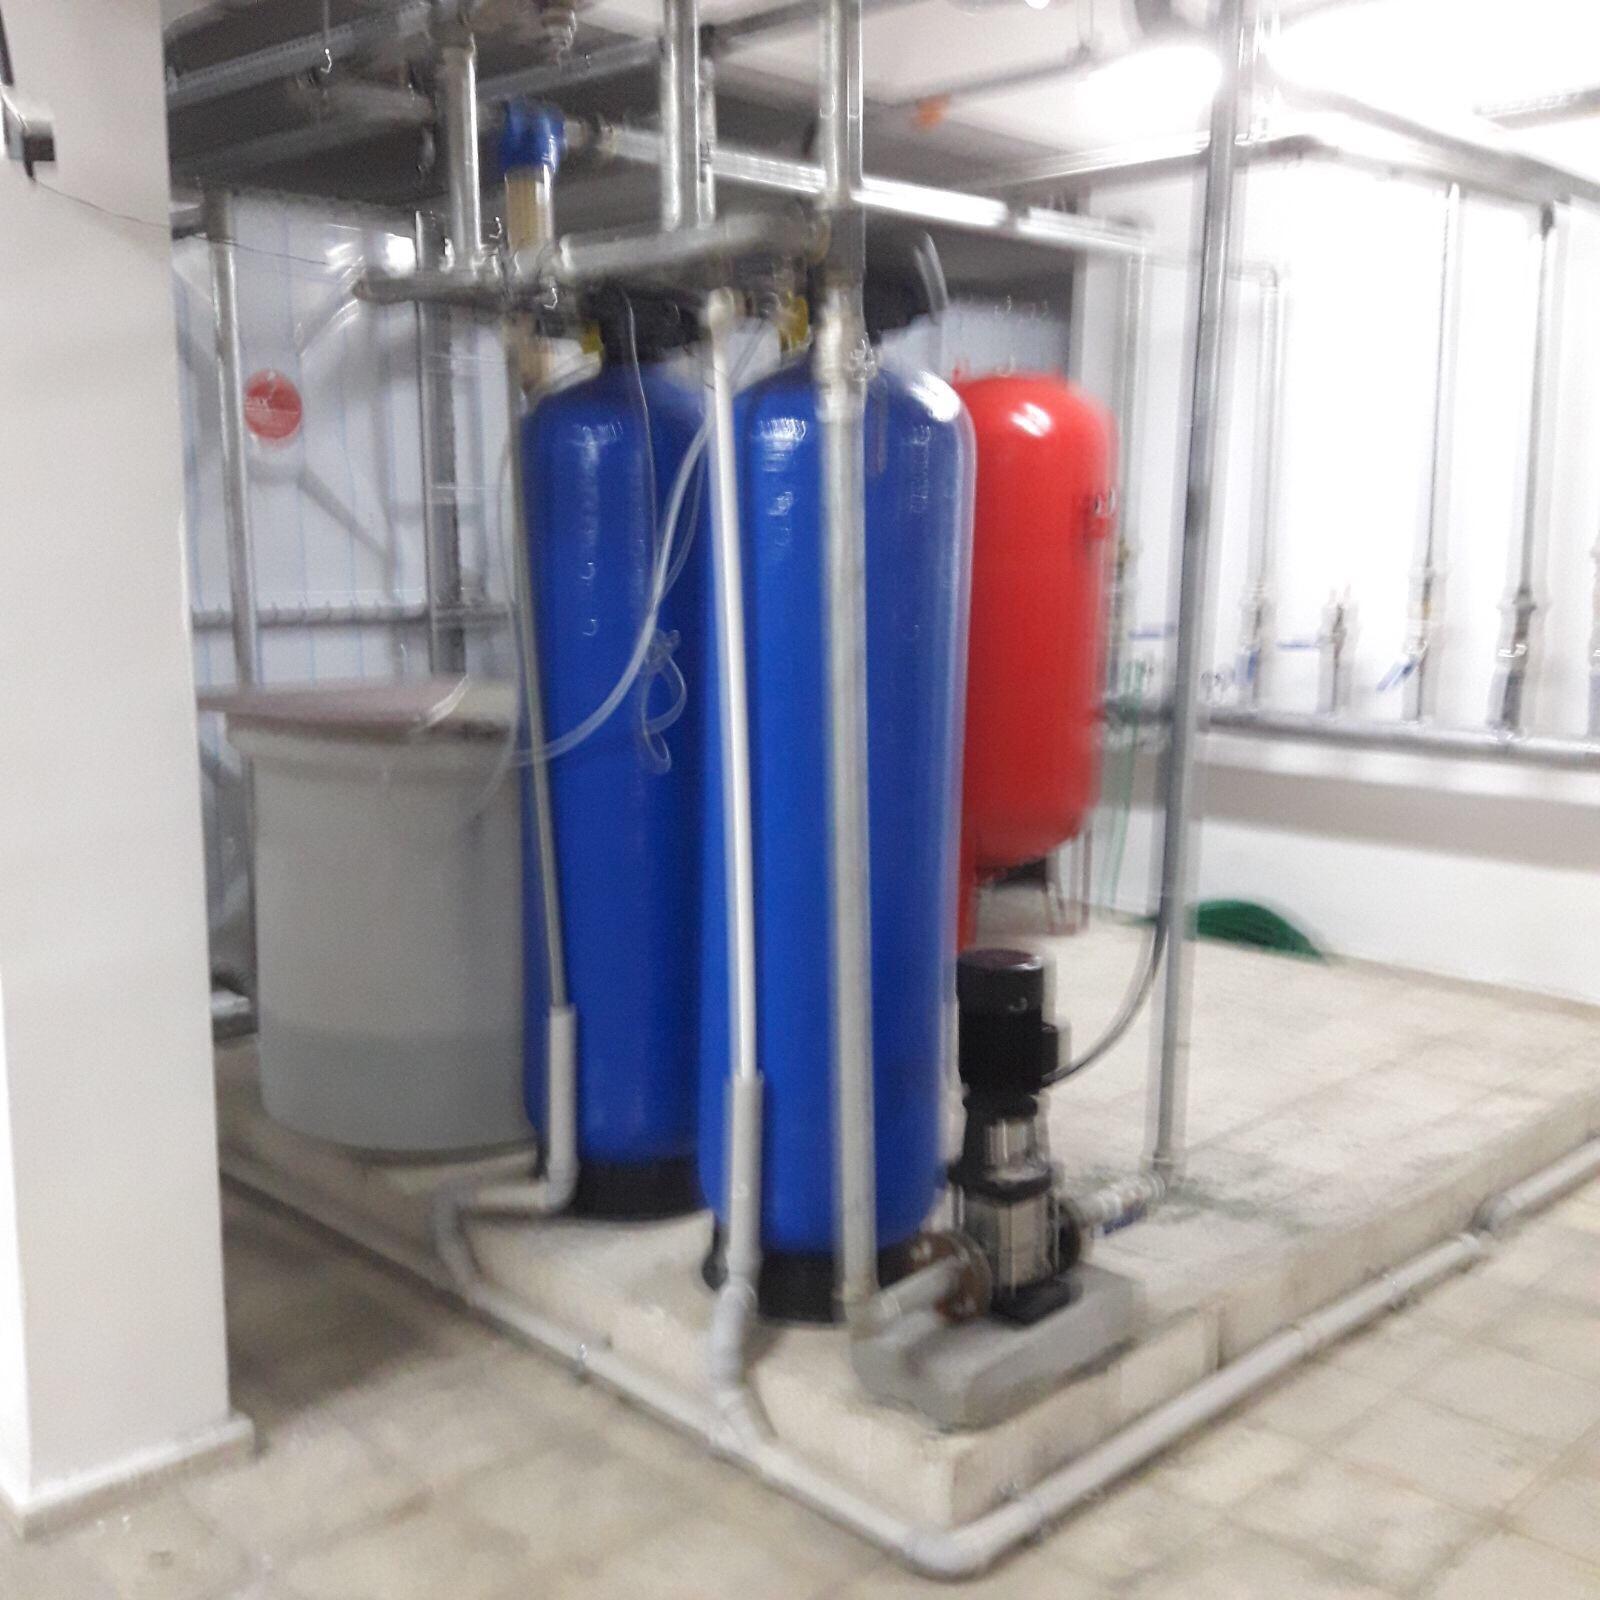 endüstriyel su aritma cihazları